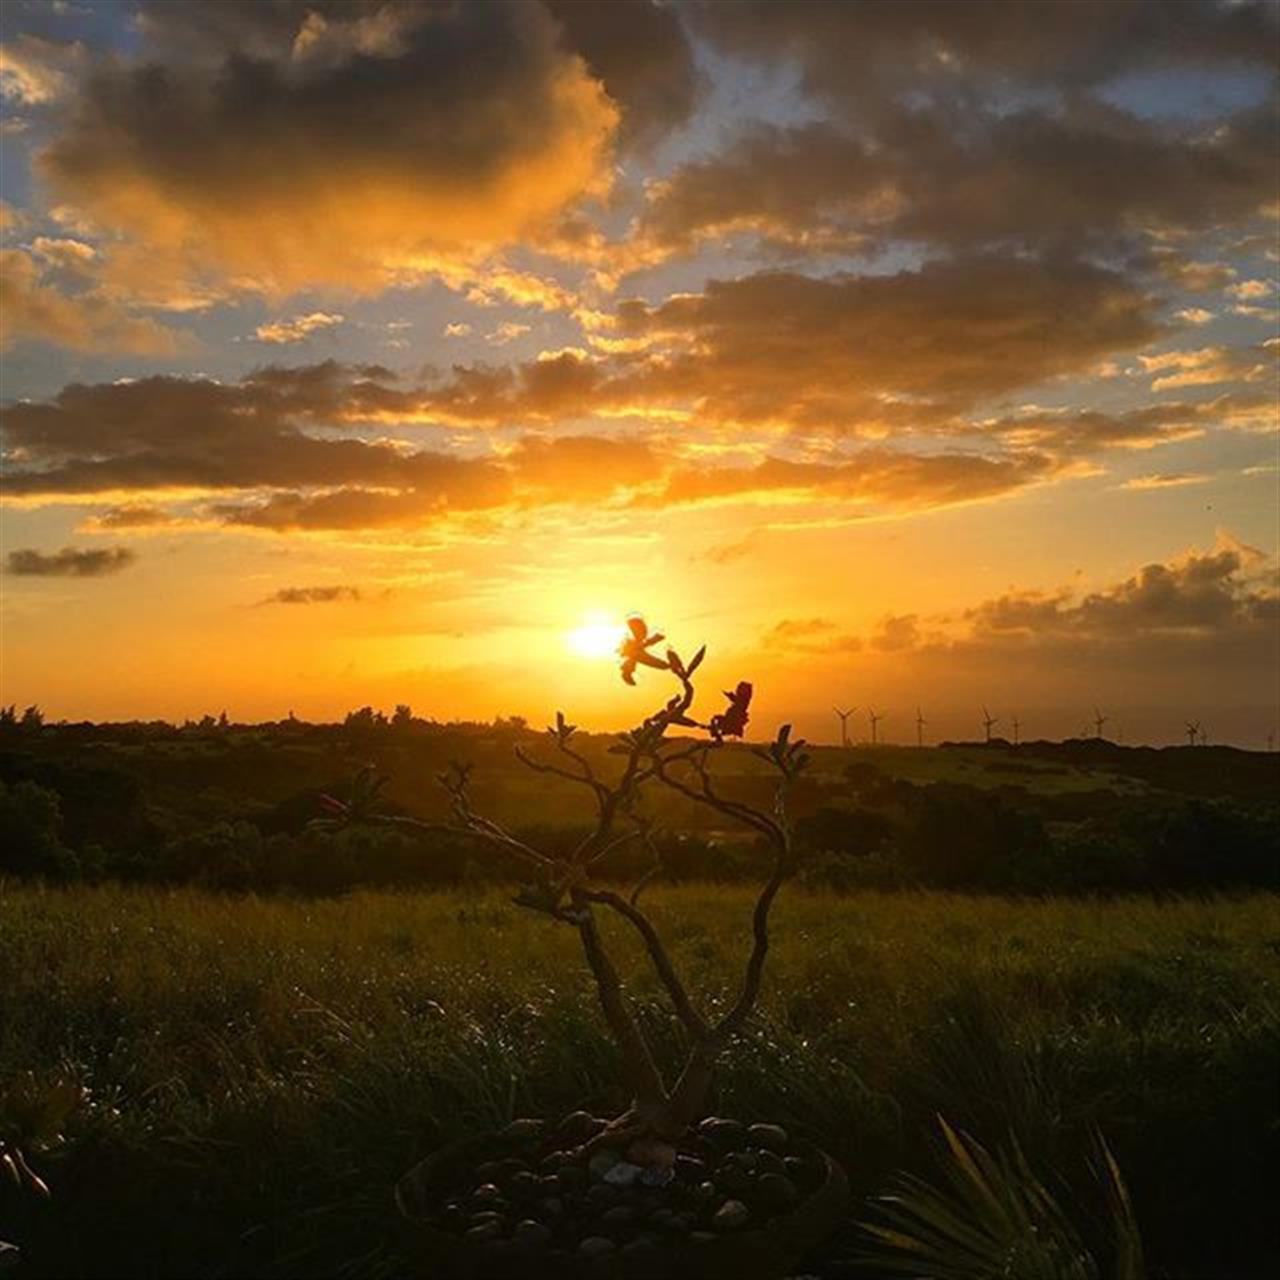 Sun kissed sky for the #4thofJuly!!! ???????? #derbyfarm #sunsets #kohala